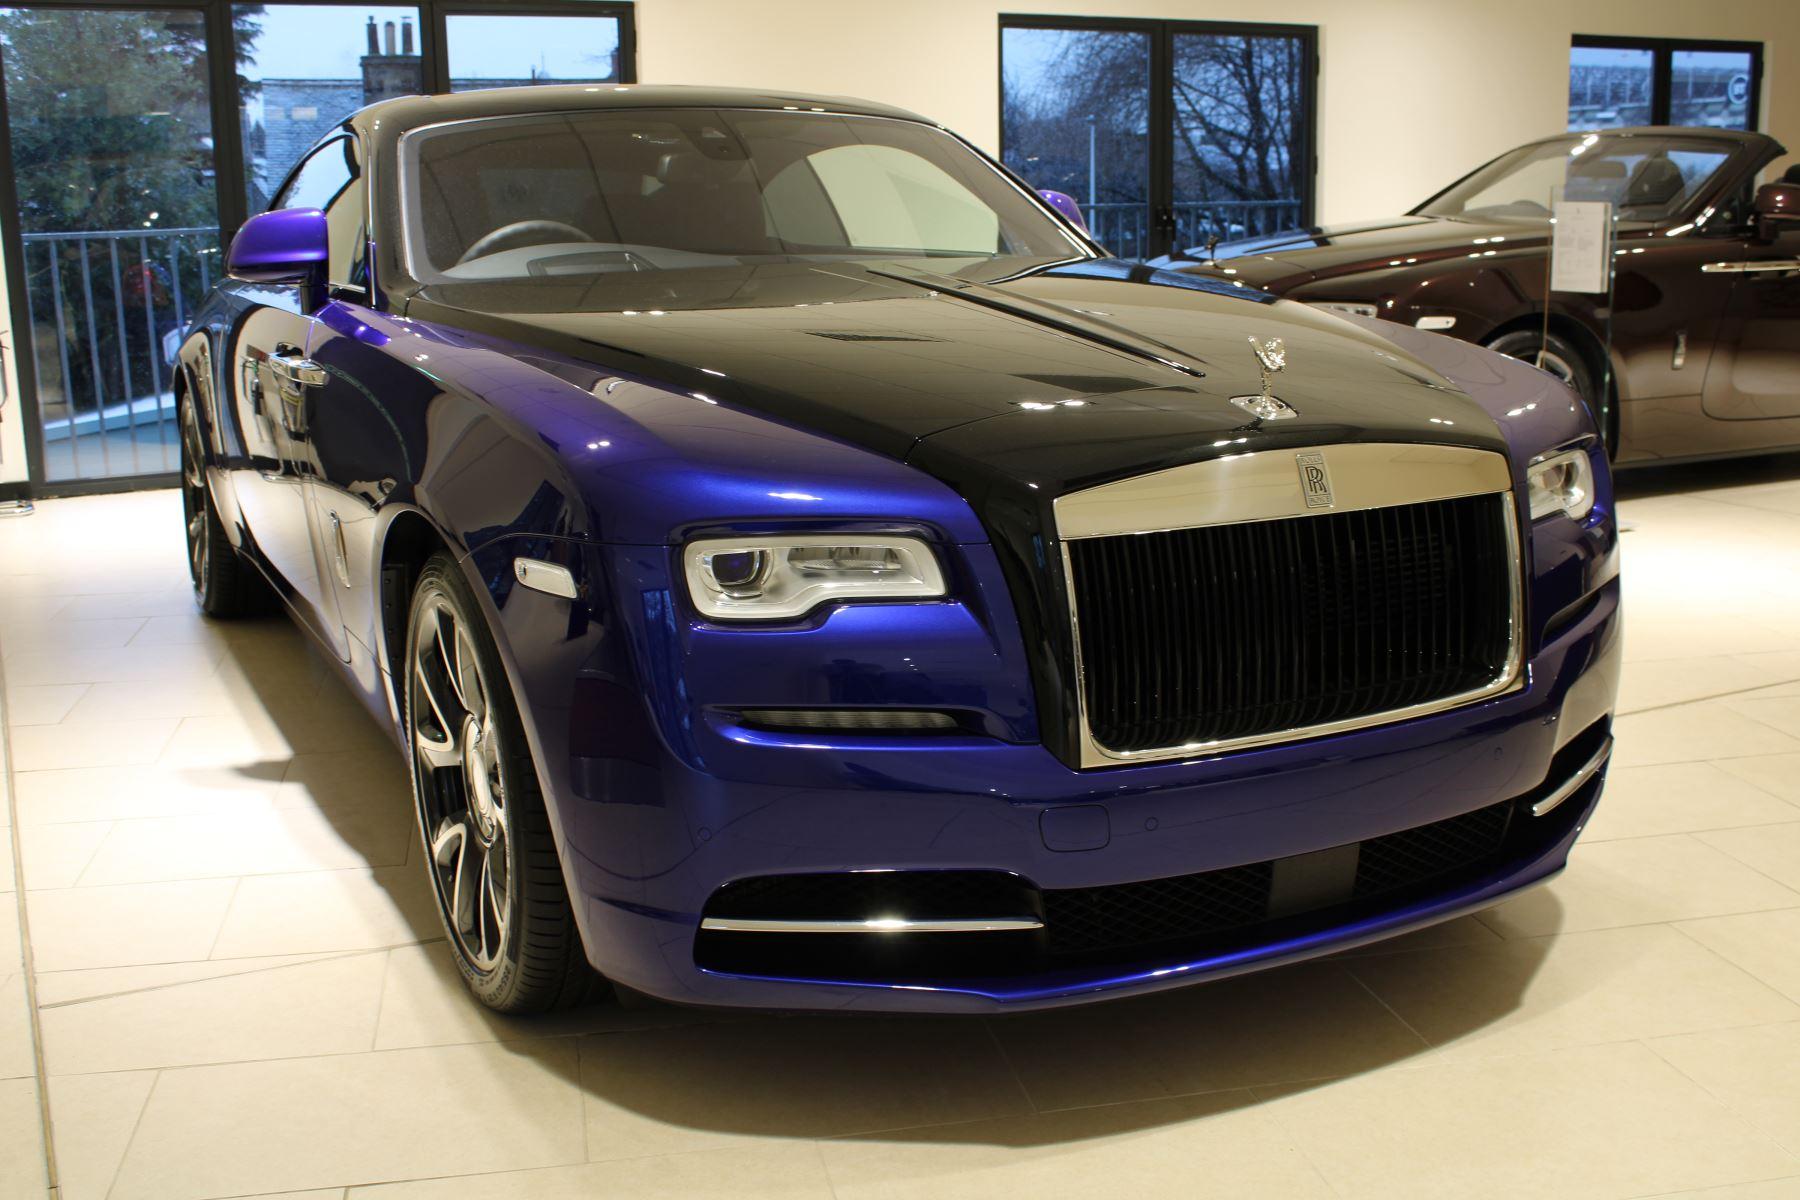 Rolls-Royce Wraith 2dr Auto 6.6 Automatic Coupe (2019)